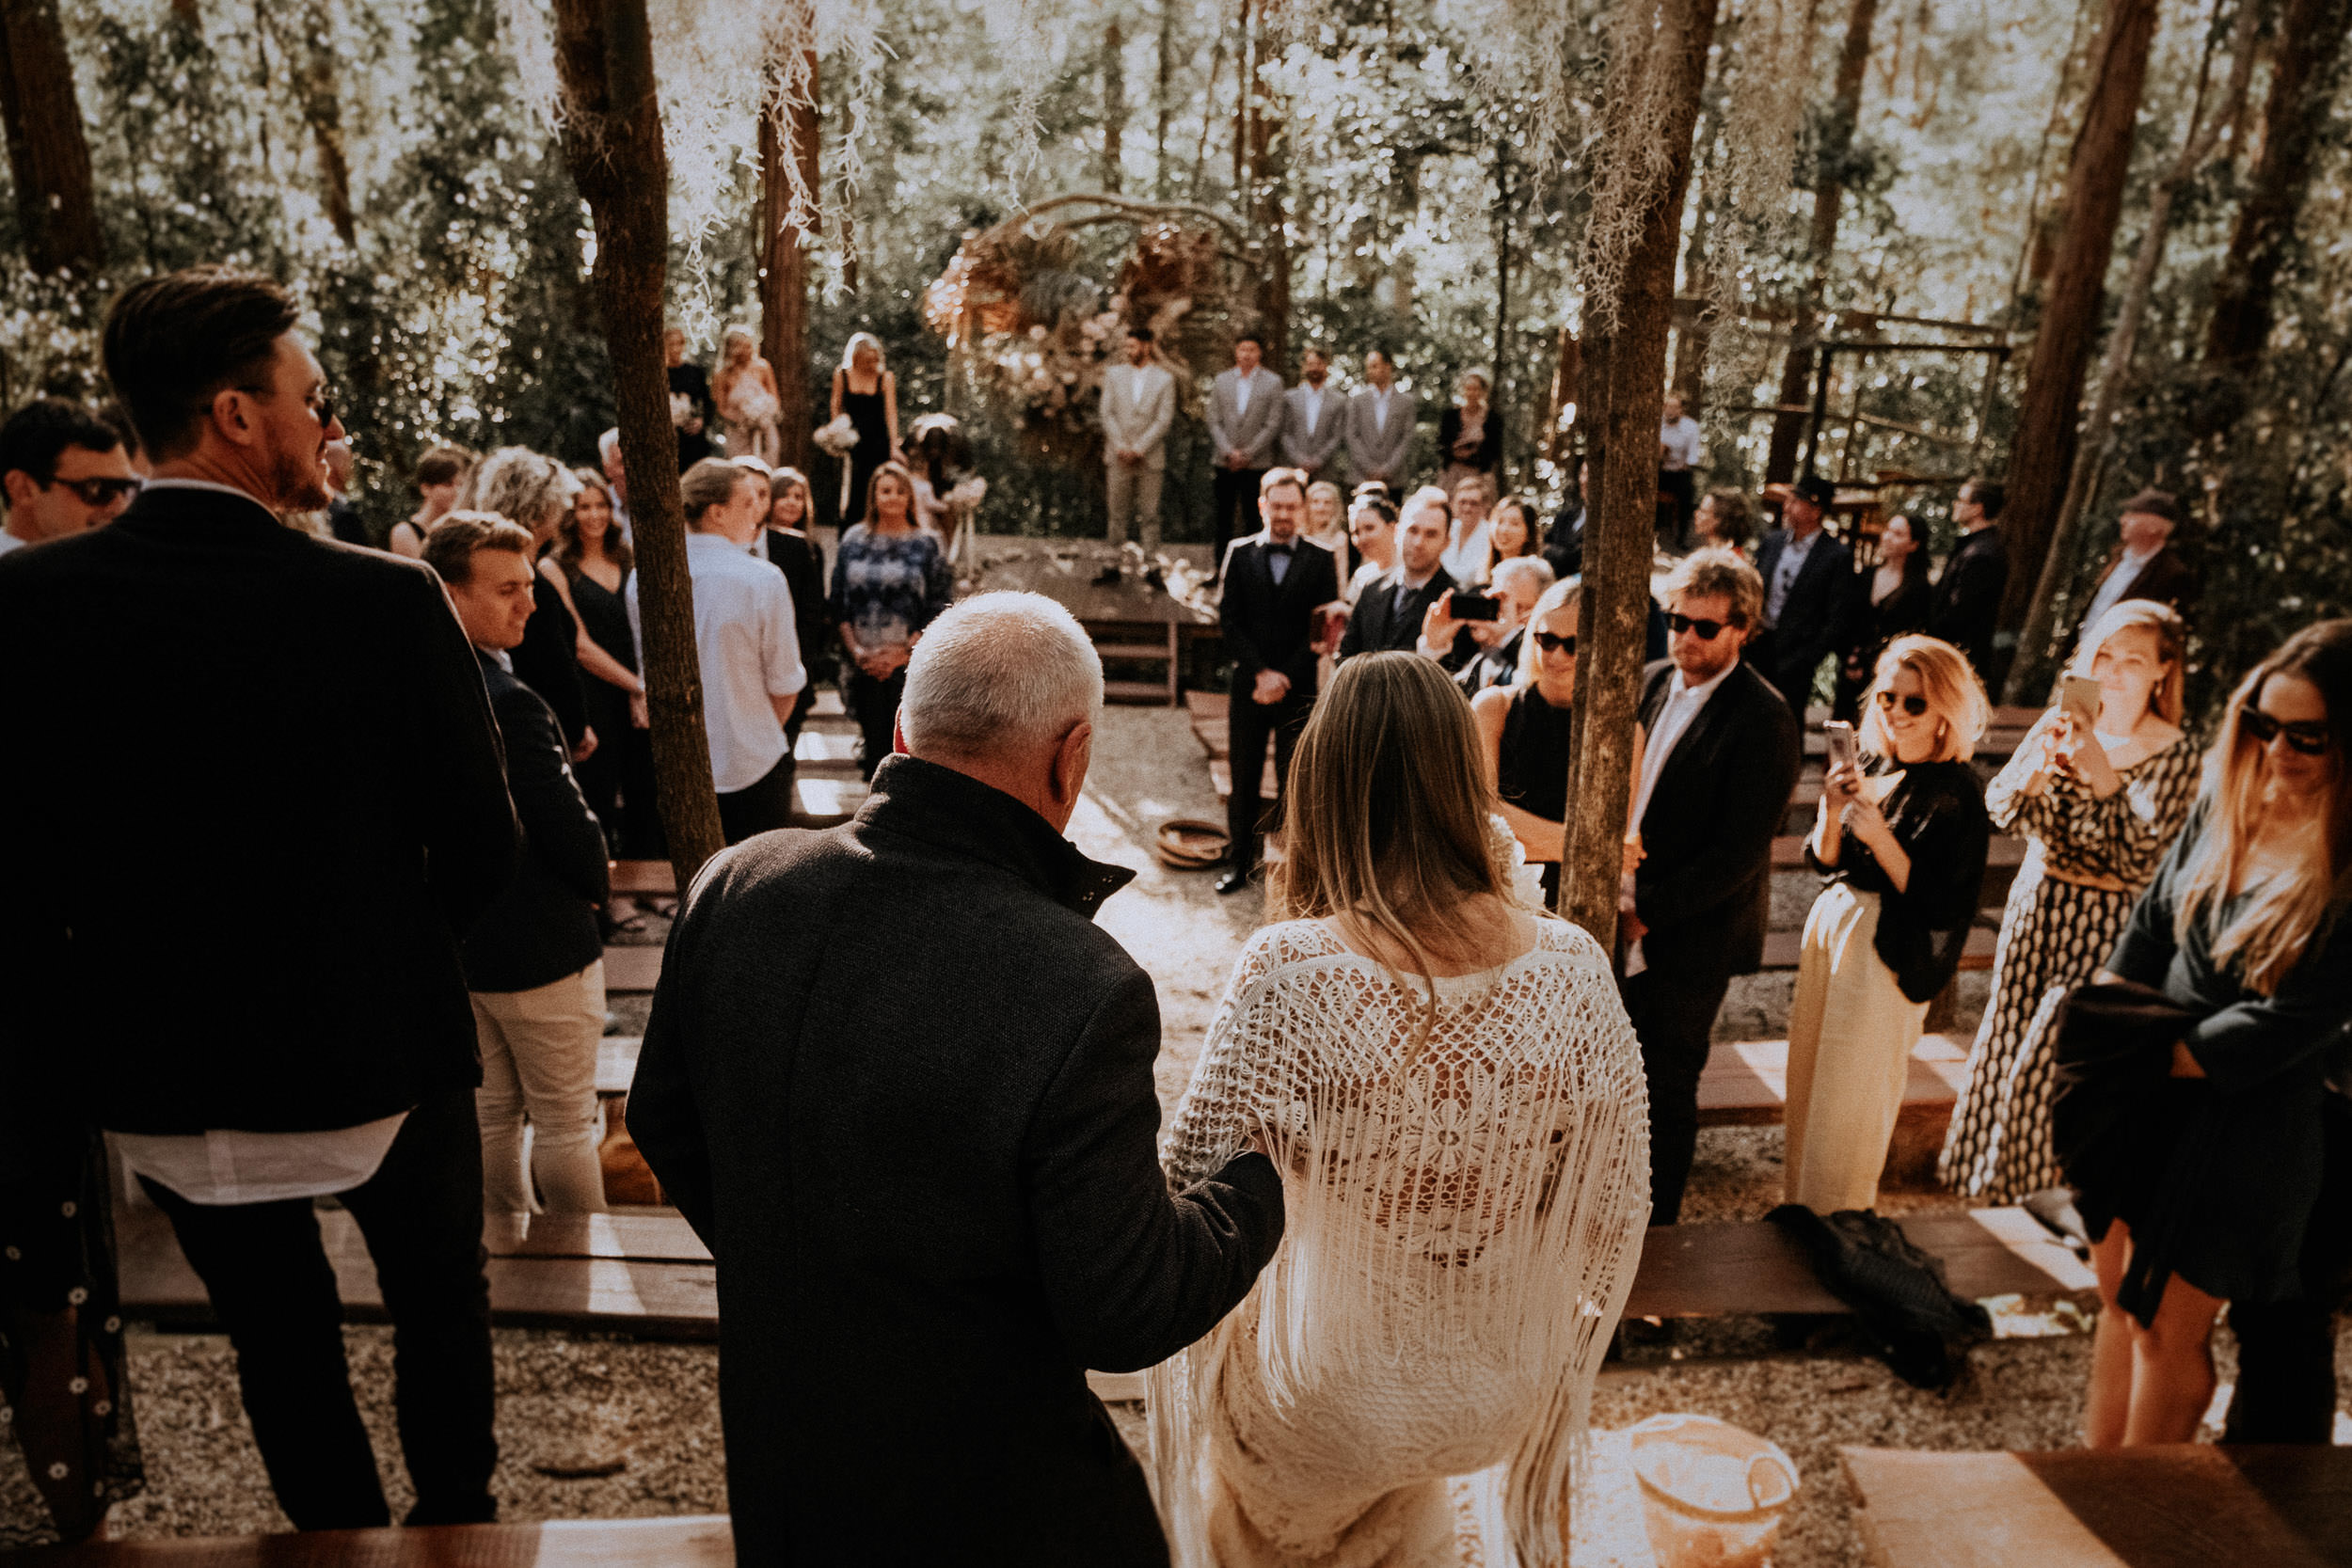 S&A Elopement - Kings & Thieves - Shred 'Til Dead - Central Coast Beach Forest Wedding - 166.jpg